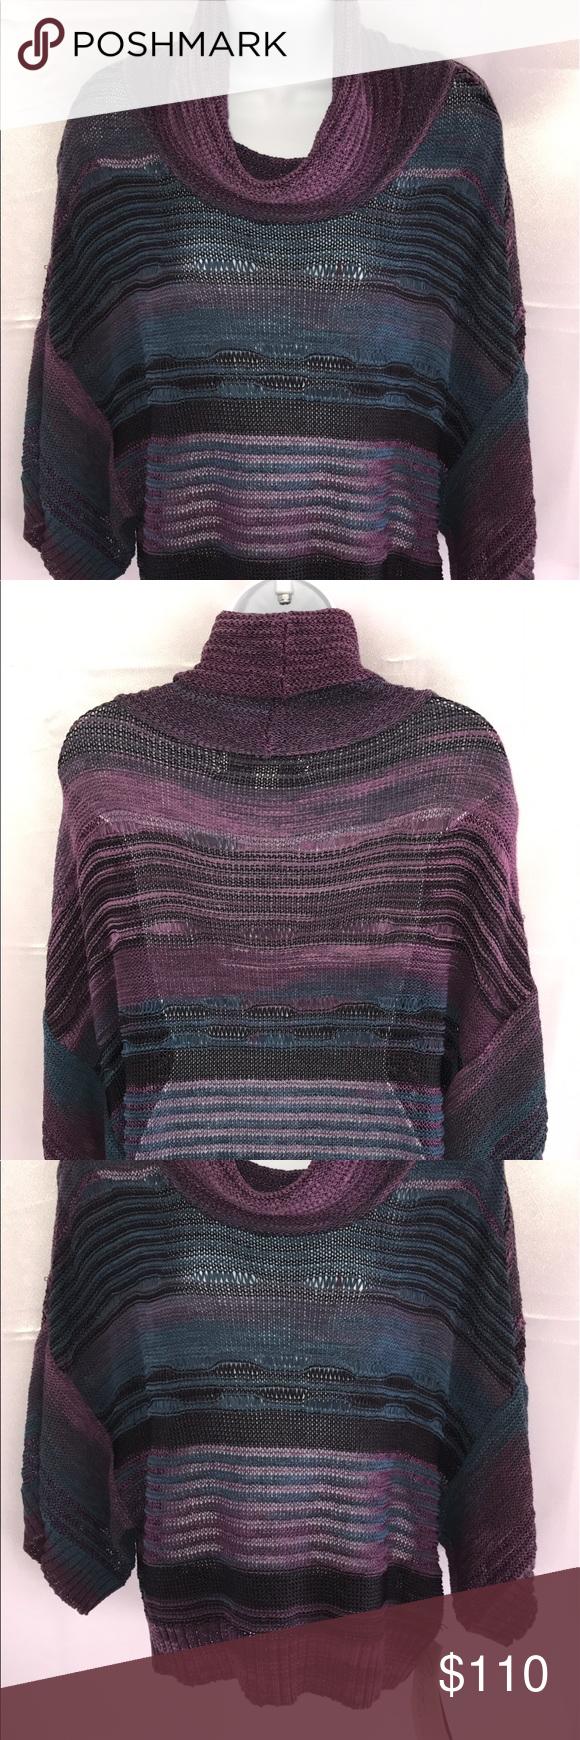 Crochet purple and black sweater Boutique | Combination colors ...